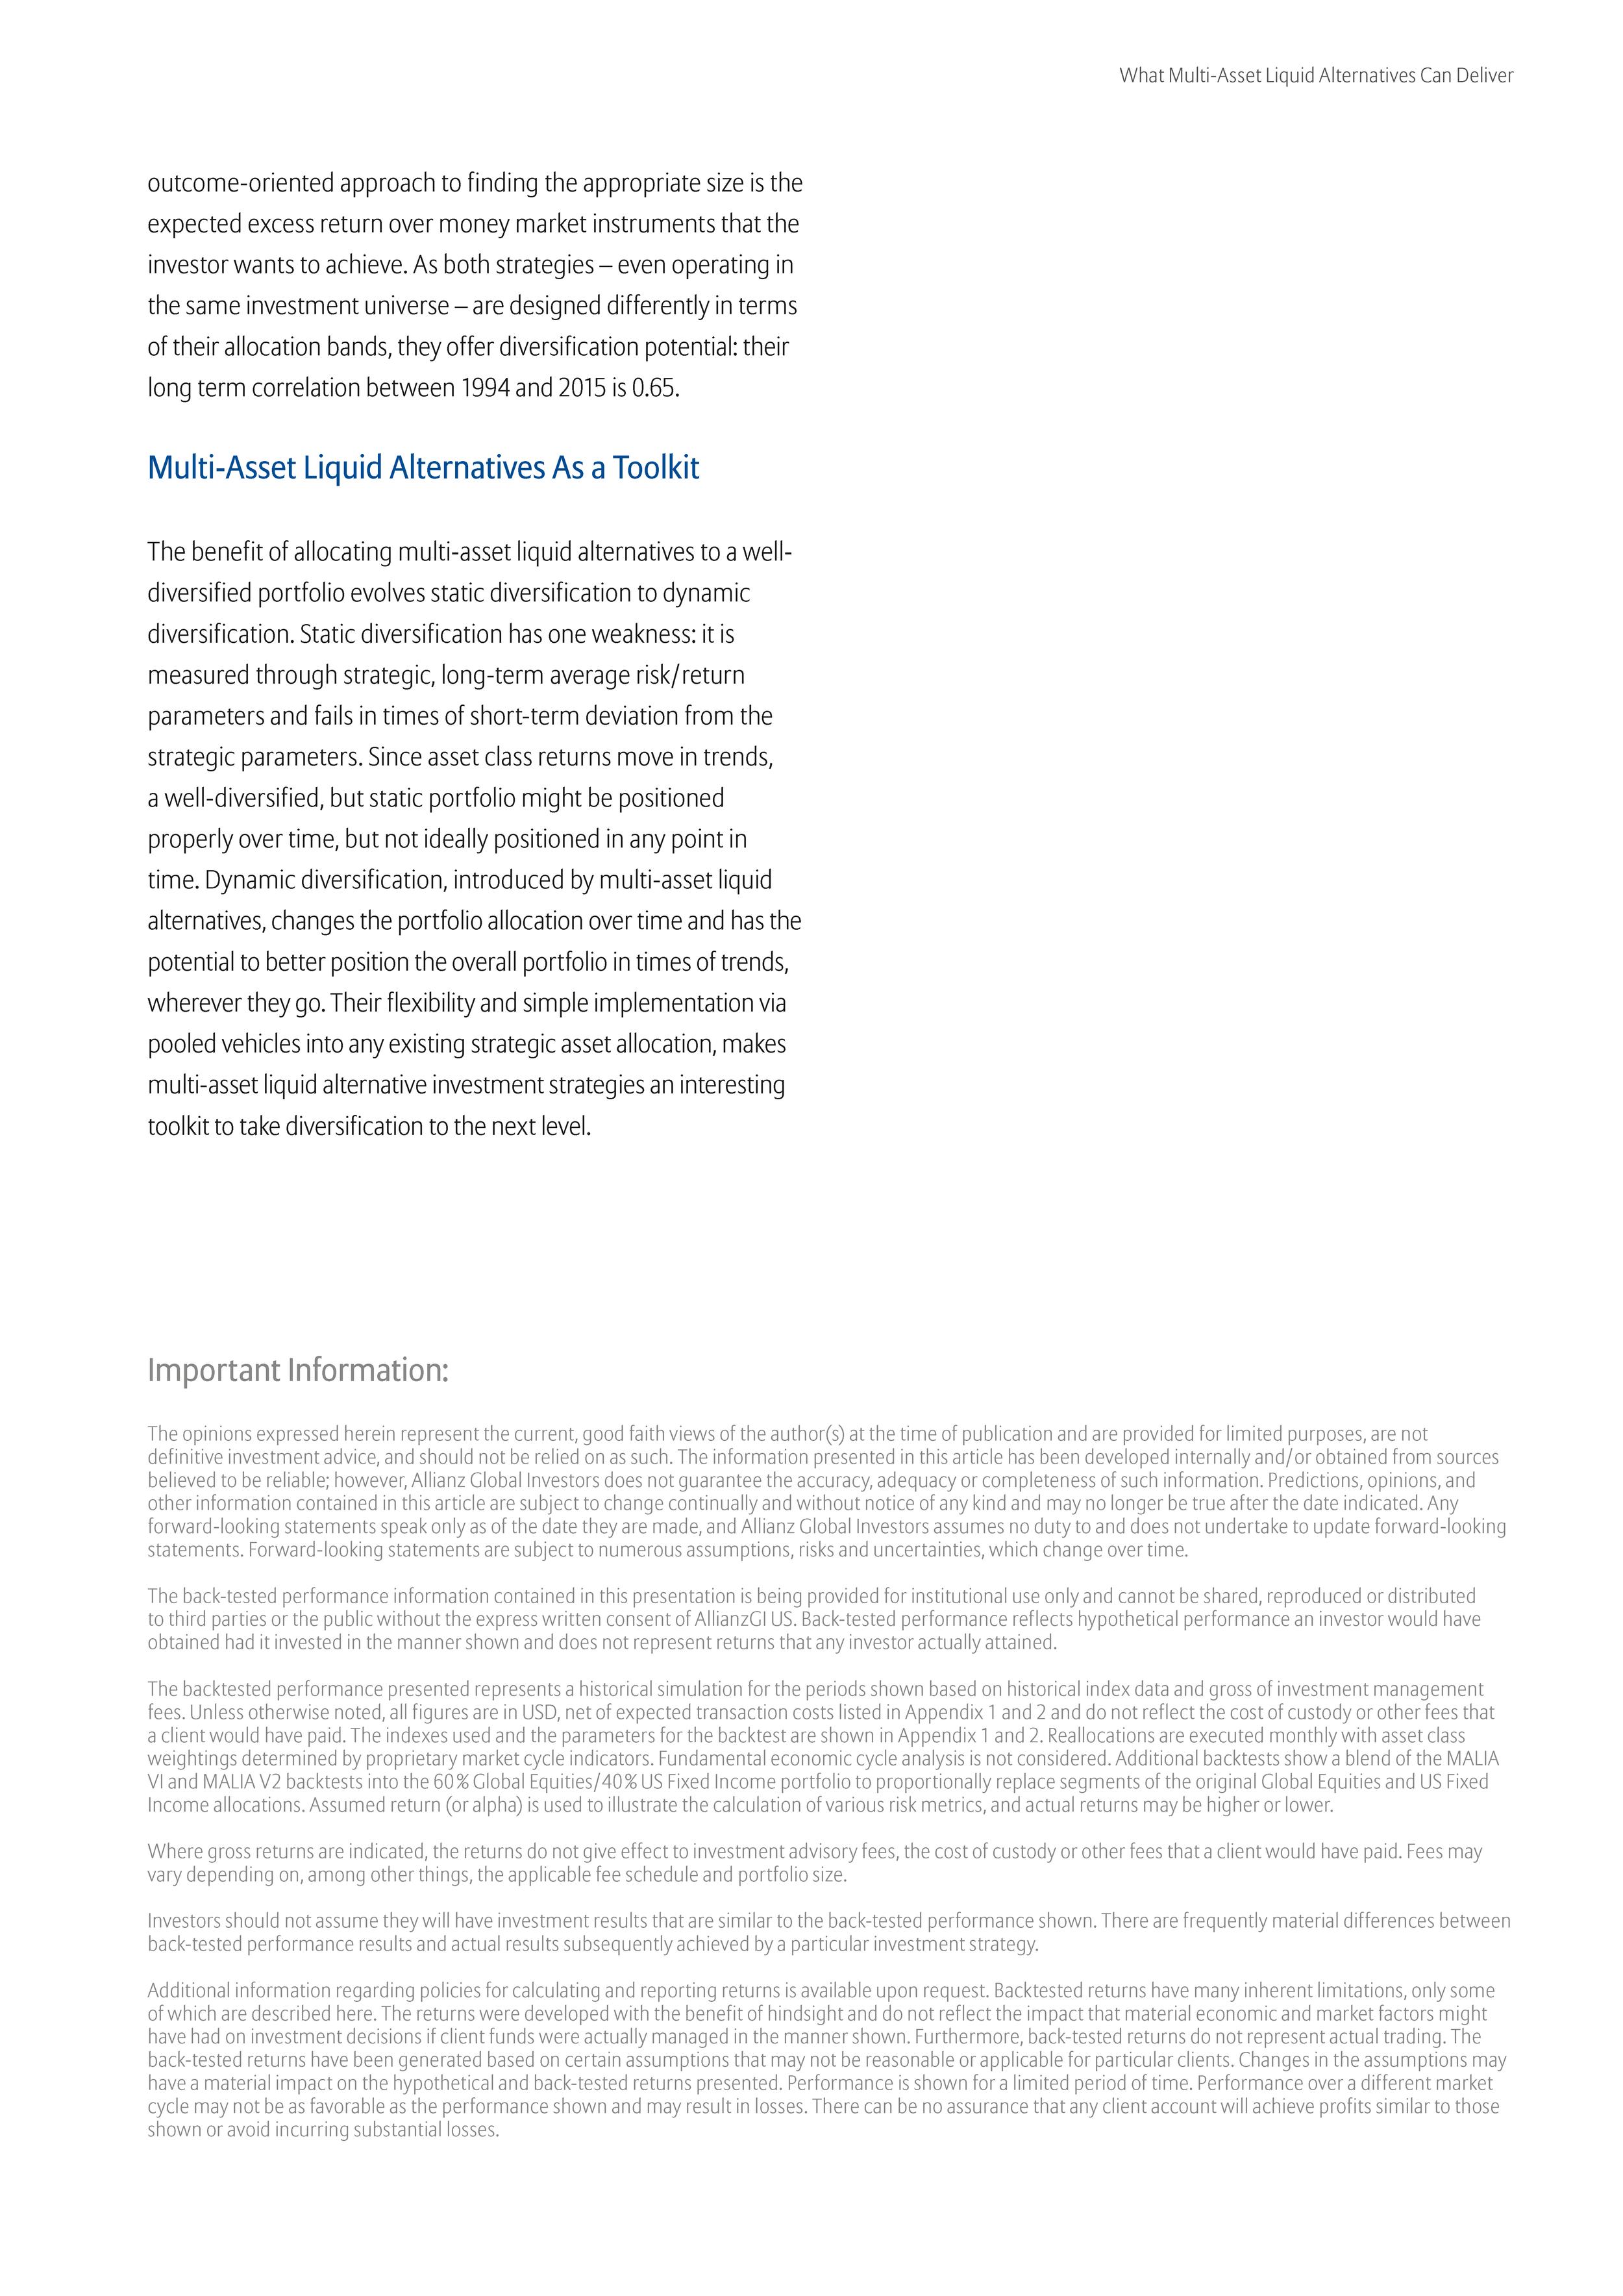 201608_Fokus Multi-Asset Liquid Alternatives_EN_Page_7.png